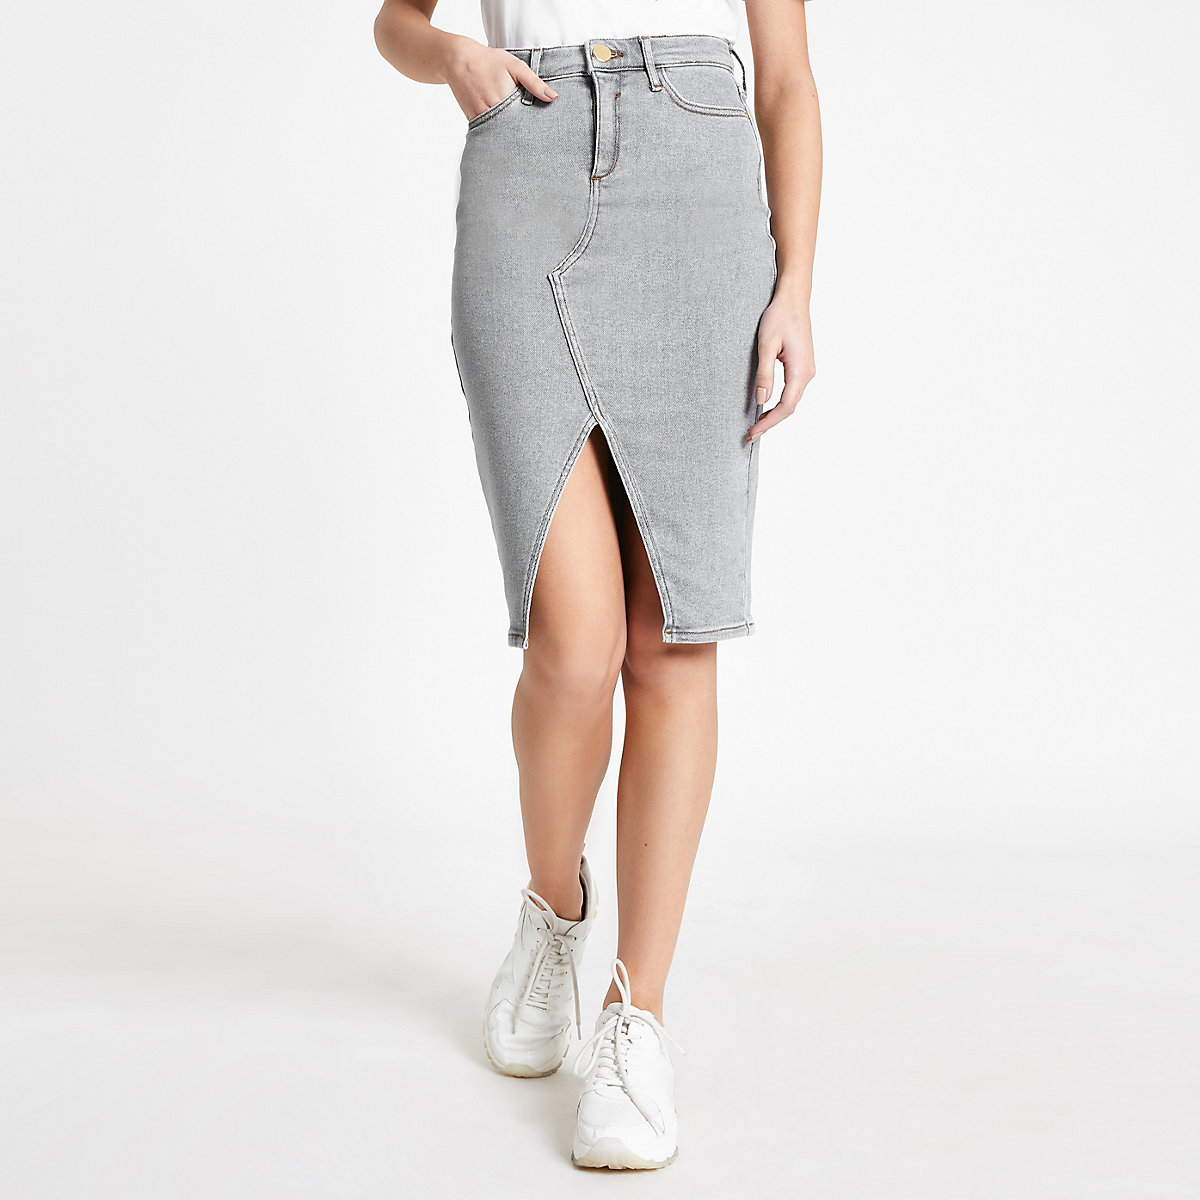 Grey denim split front pencil skirt